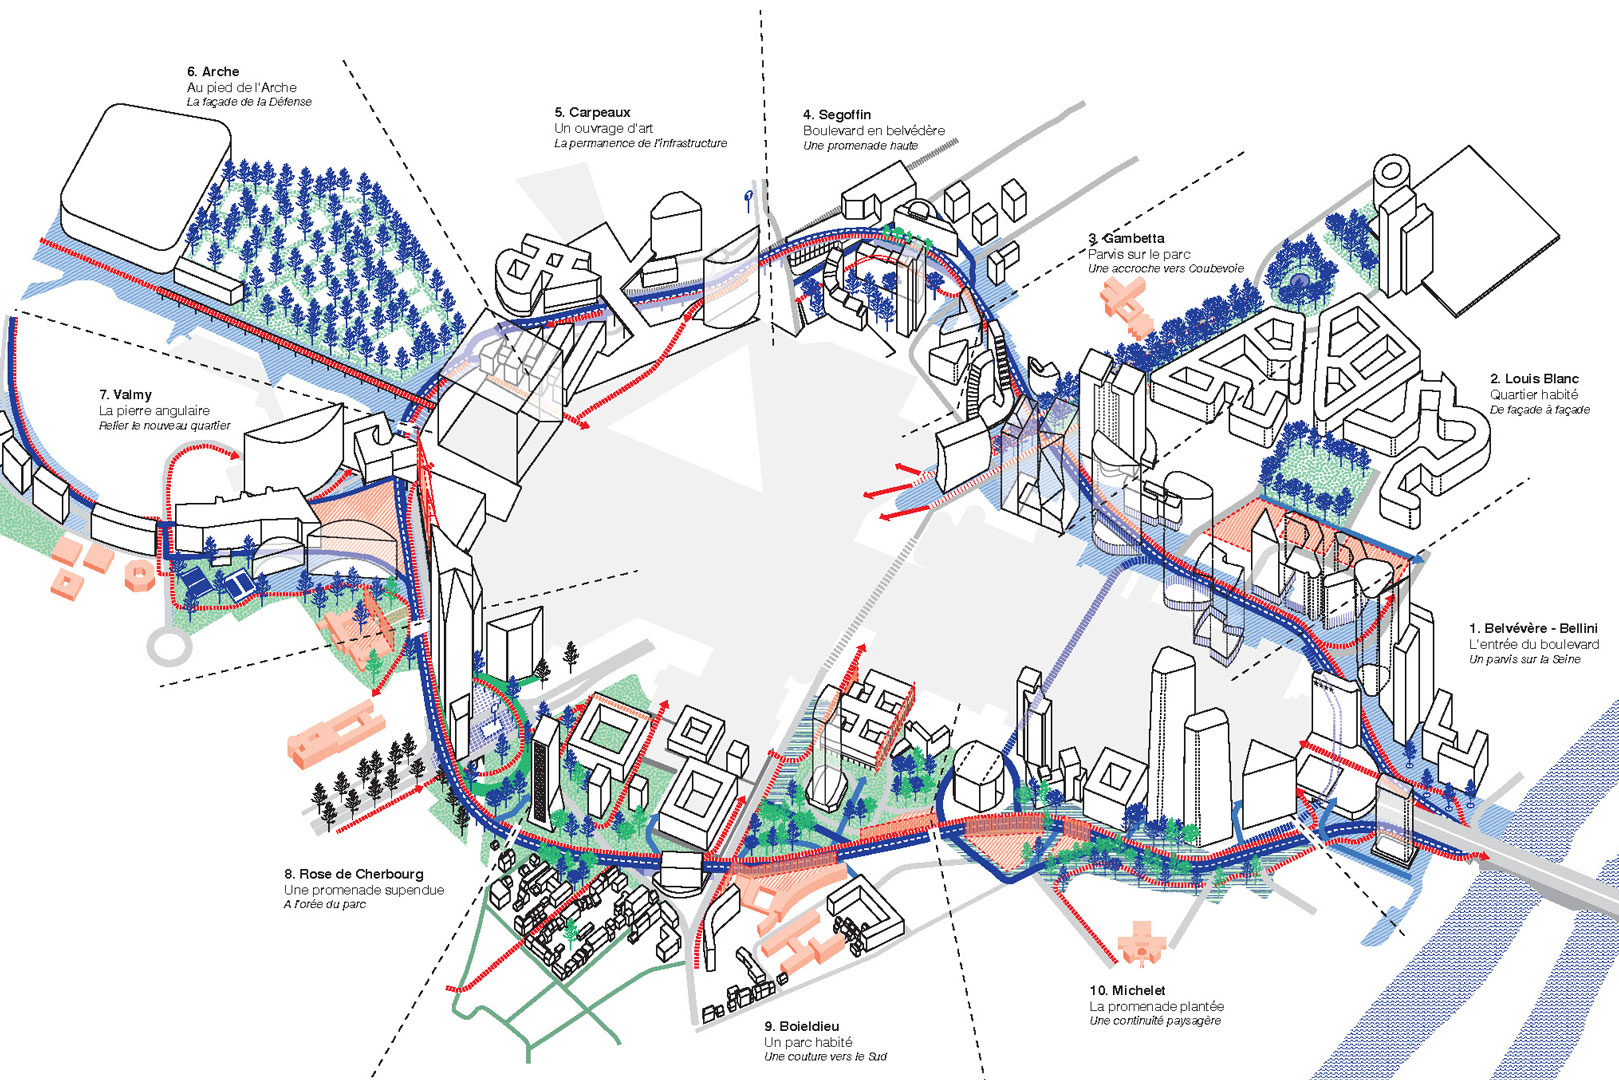 ANMA La Défense Boulevard Circulaire